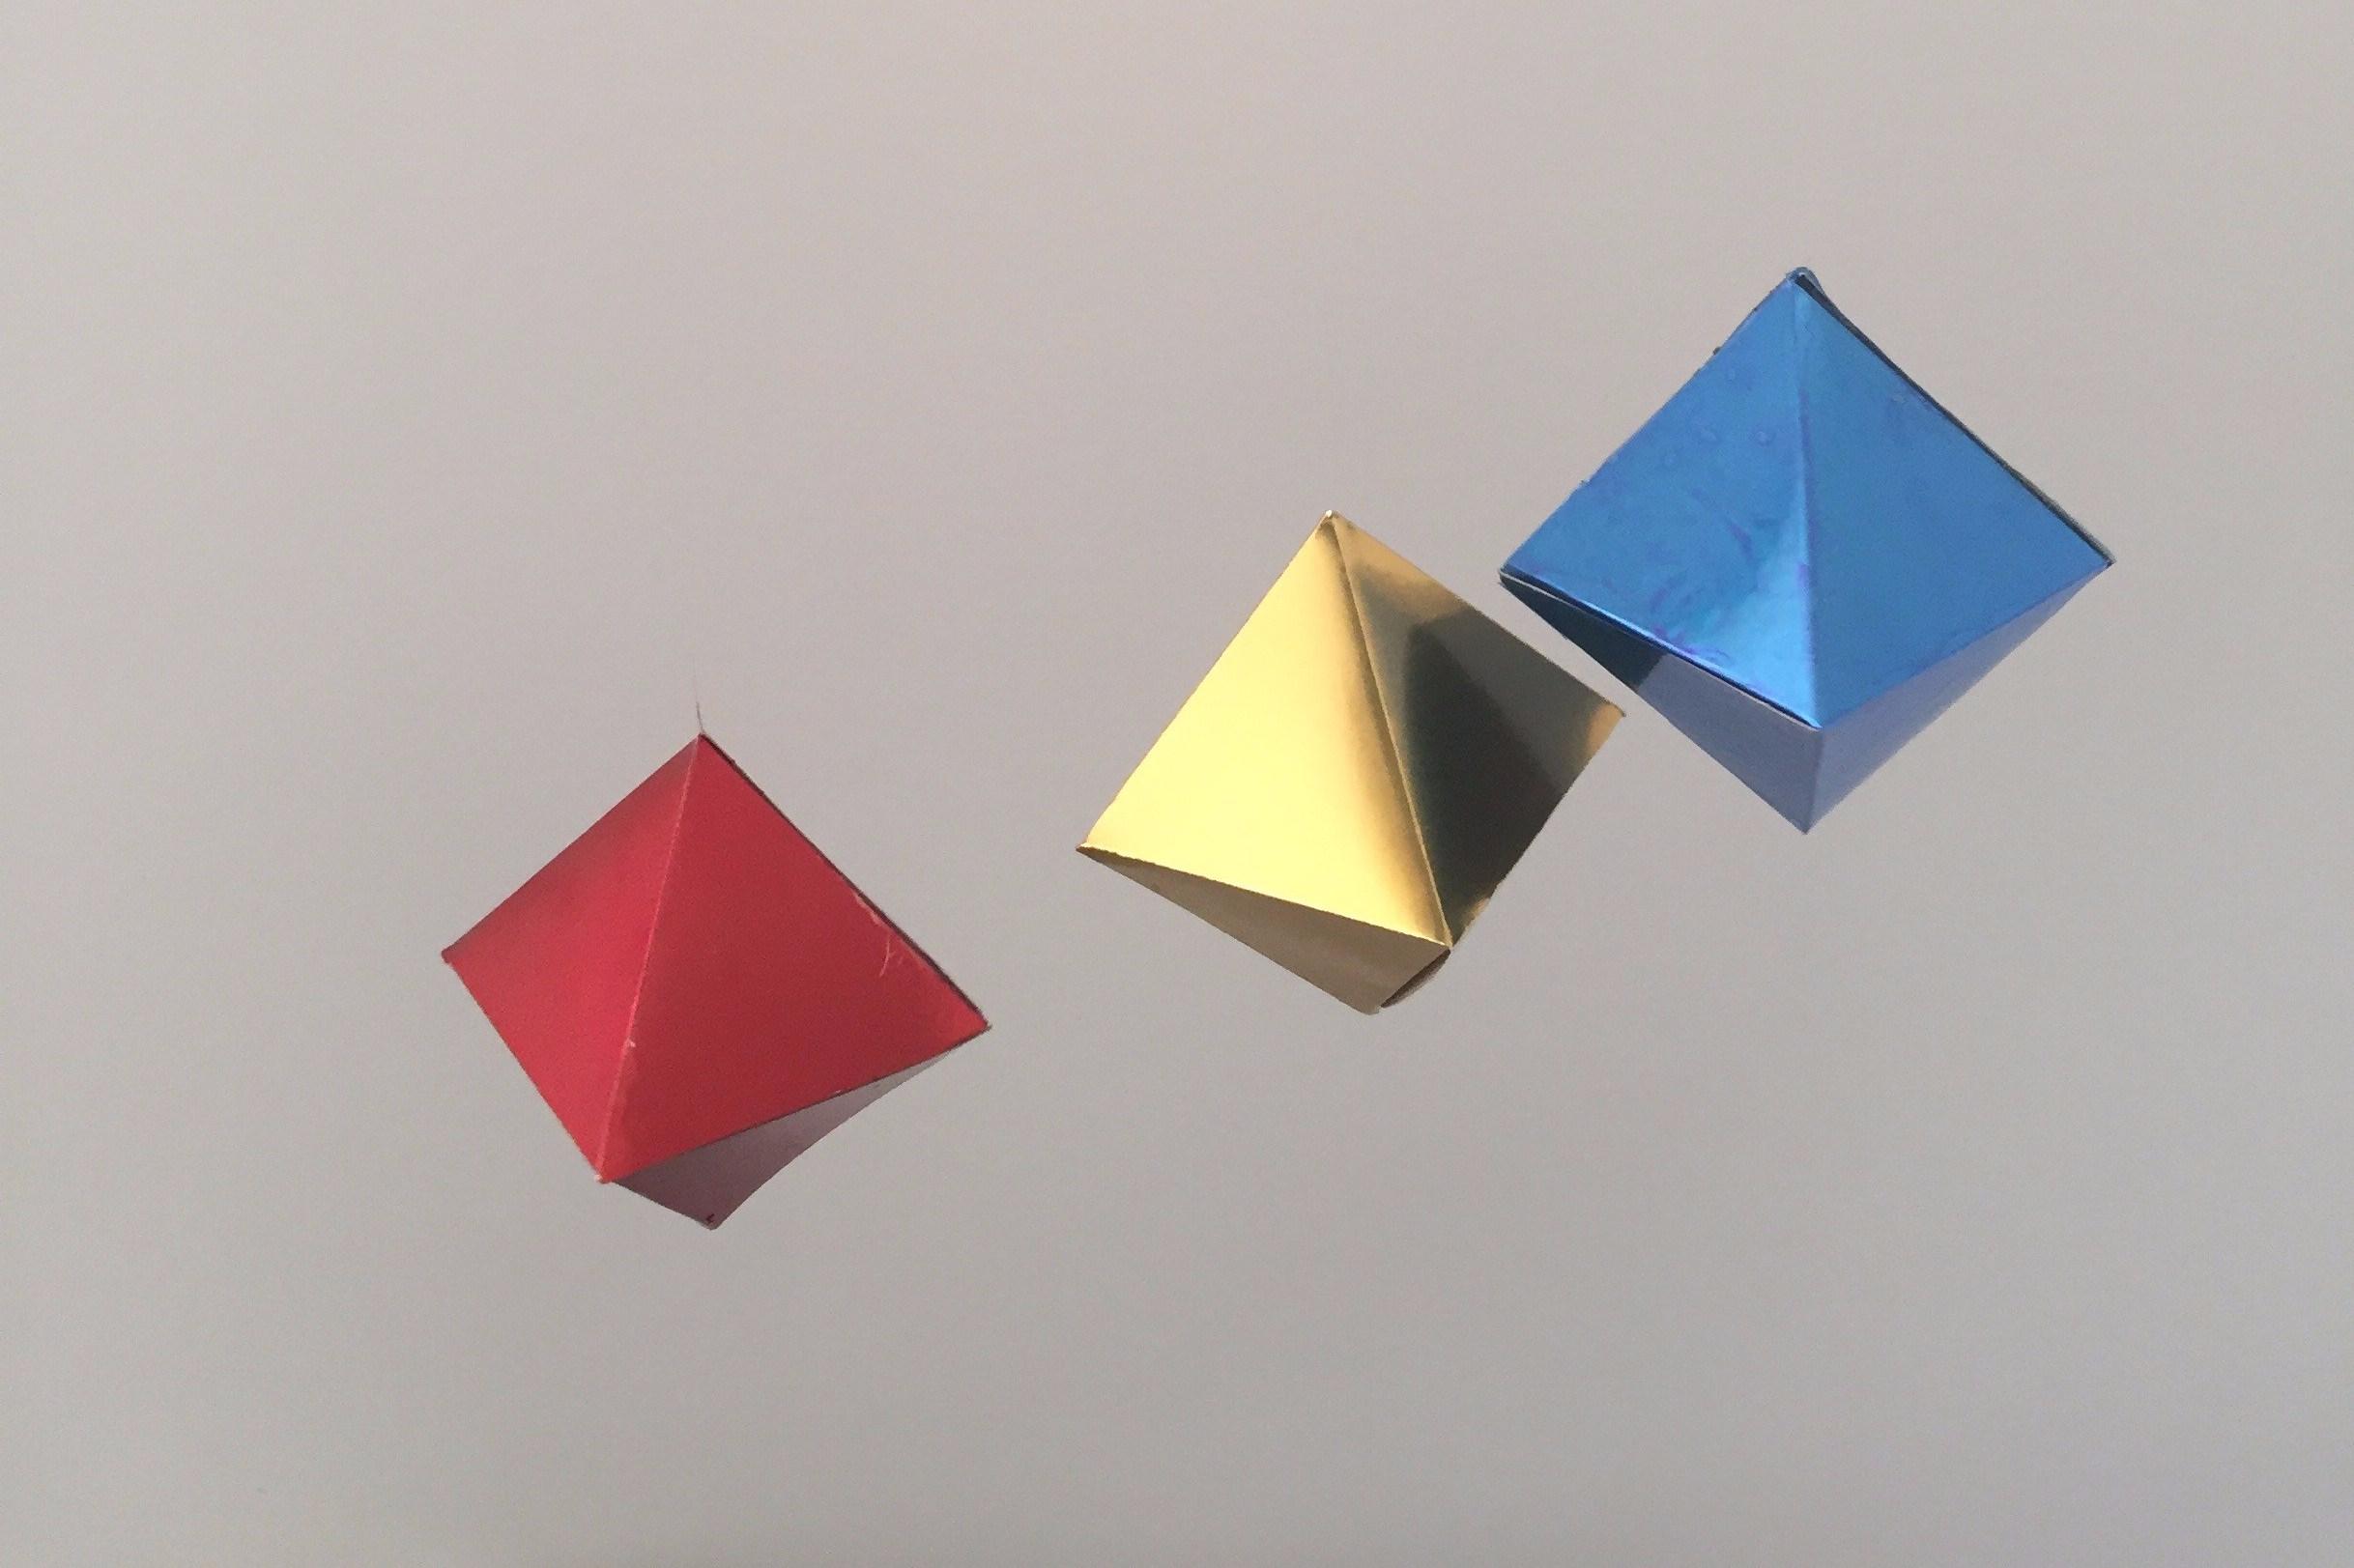 FUCHS L/üftungsfl/ügel anstatt 4 Glassteine im Format 19x19x8 cm Zugvorrichtung inkl